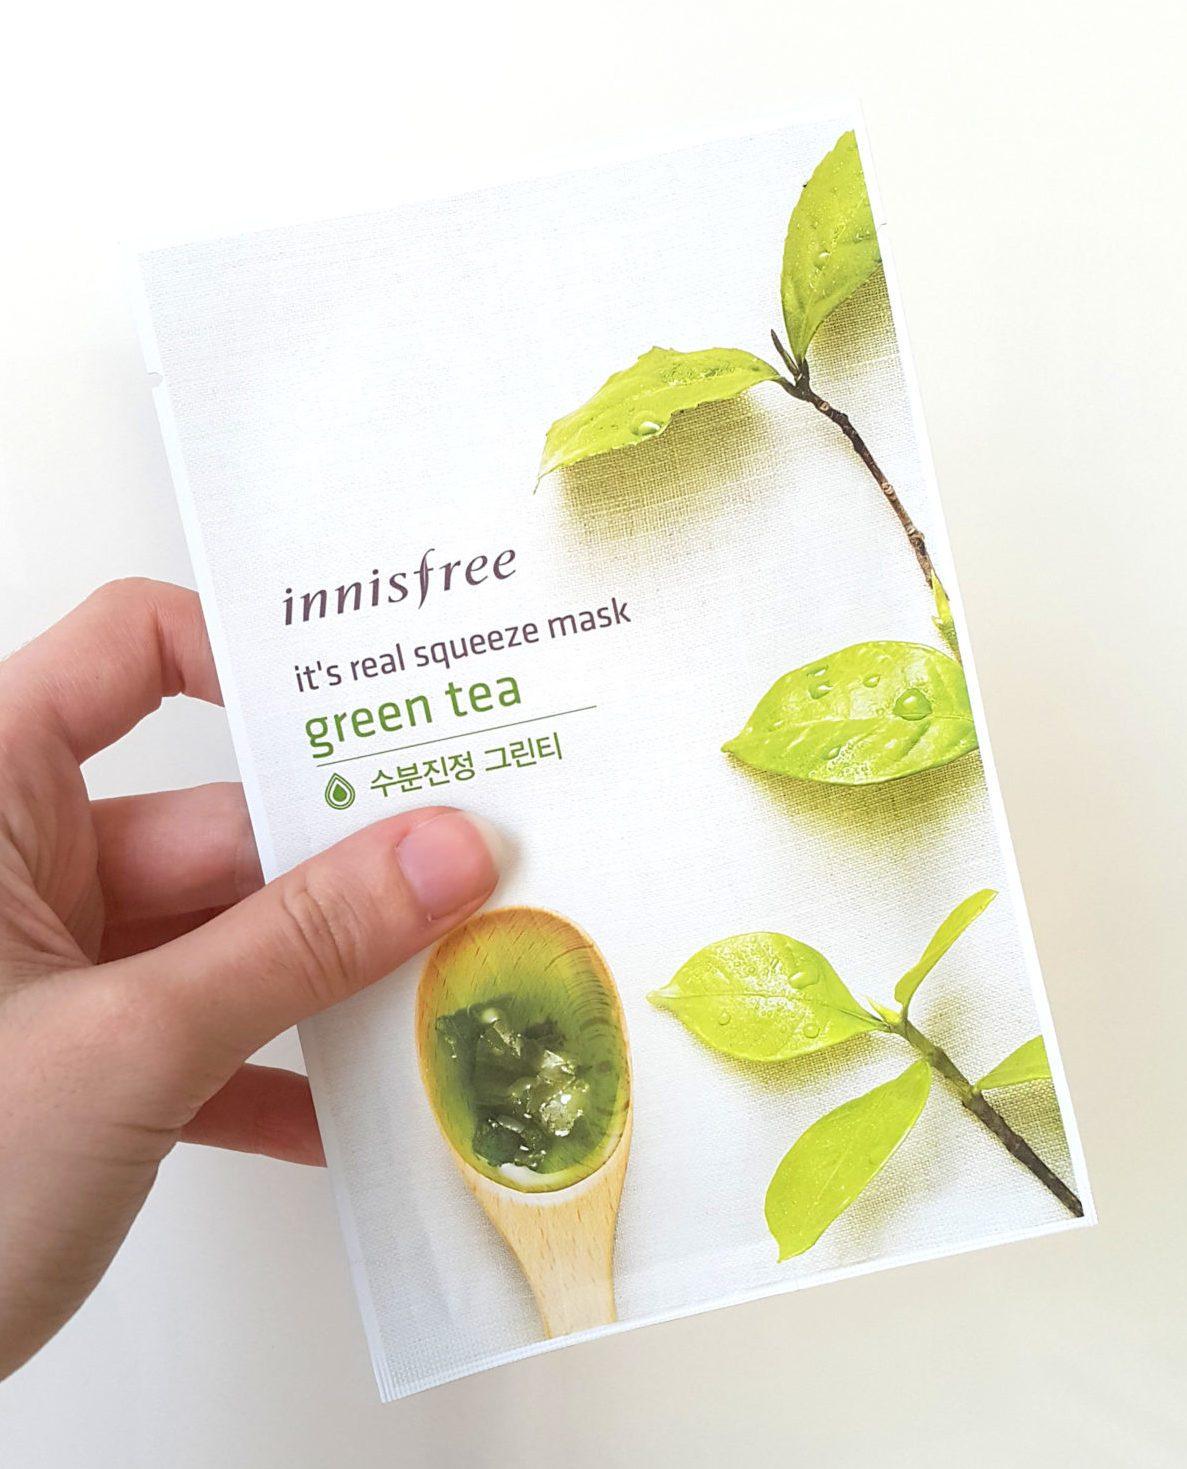 Innisfree Its Real Green Tea Mask 3 Pcs